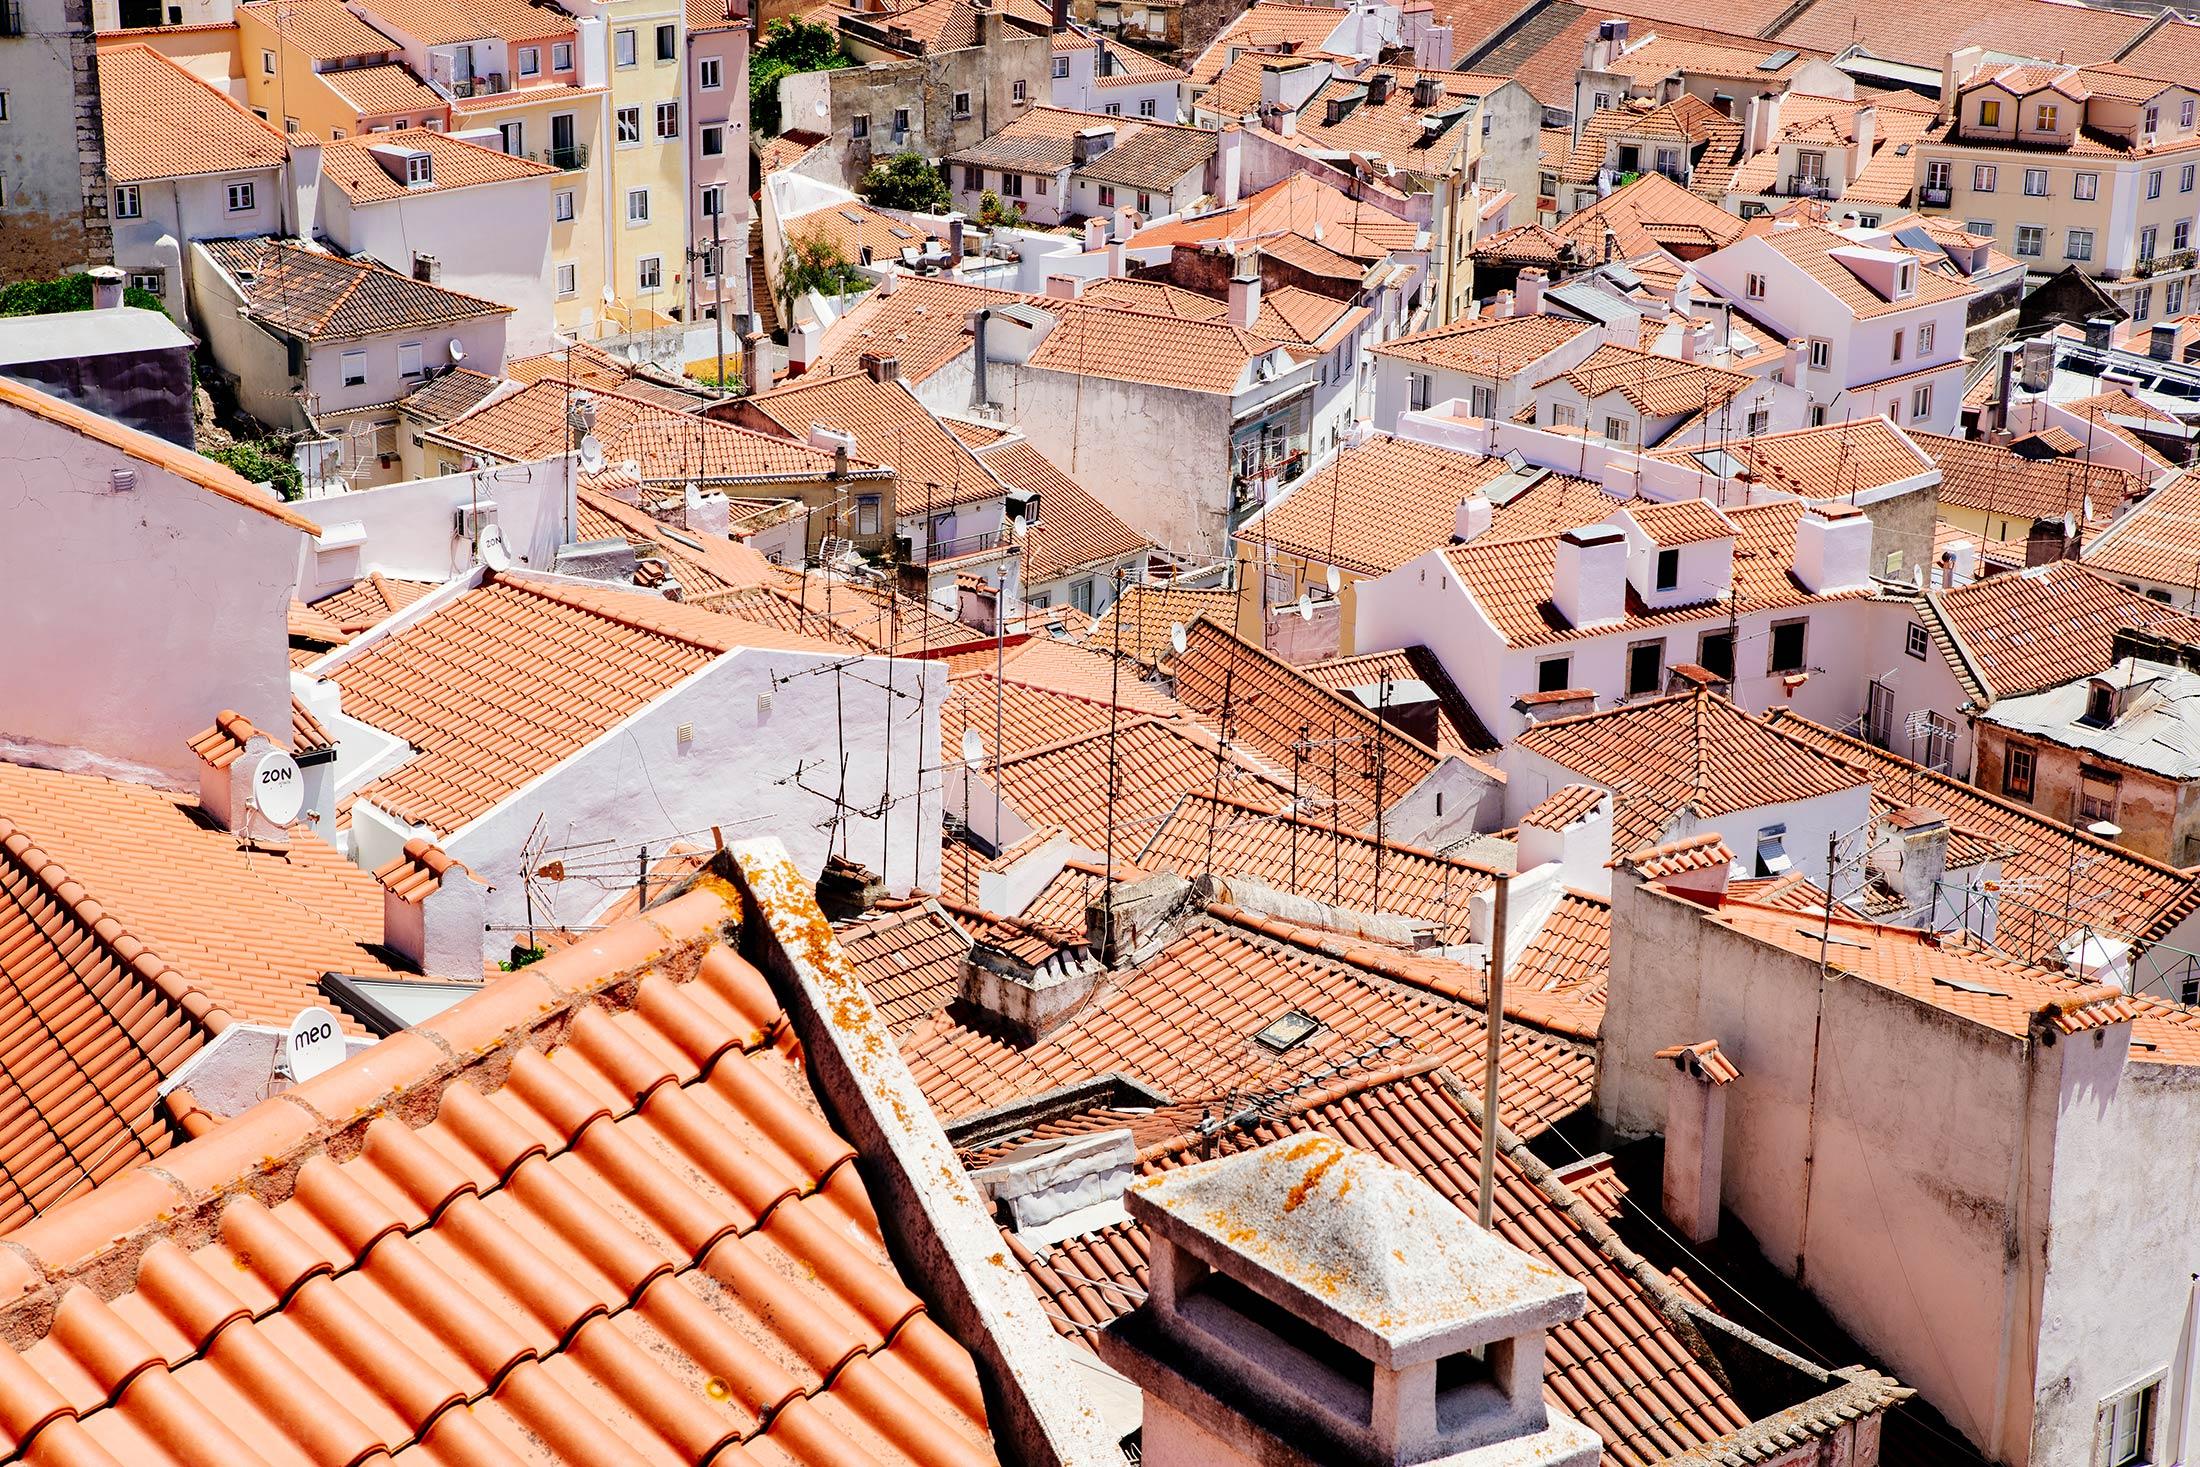 LIS_Lissabon_08-Mitja_Schneehage